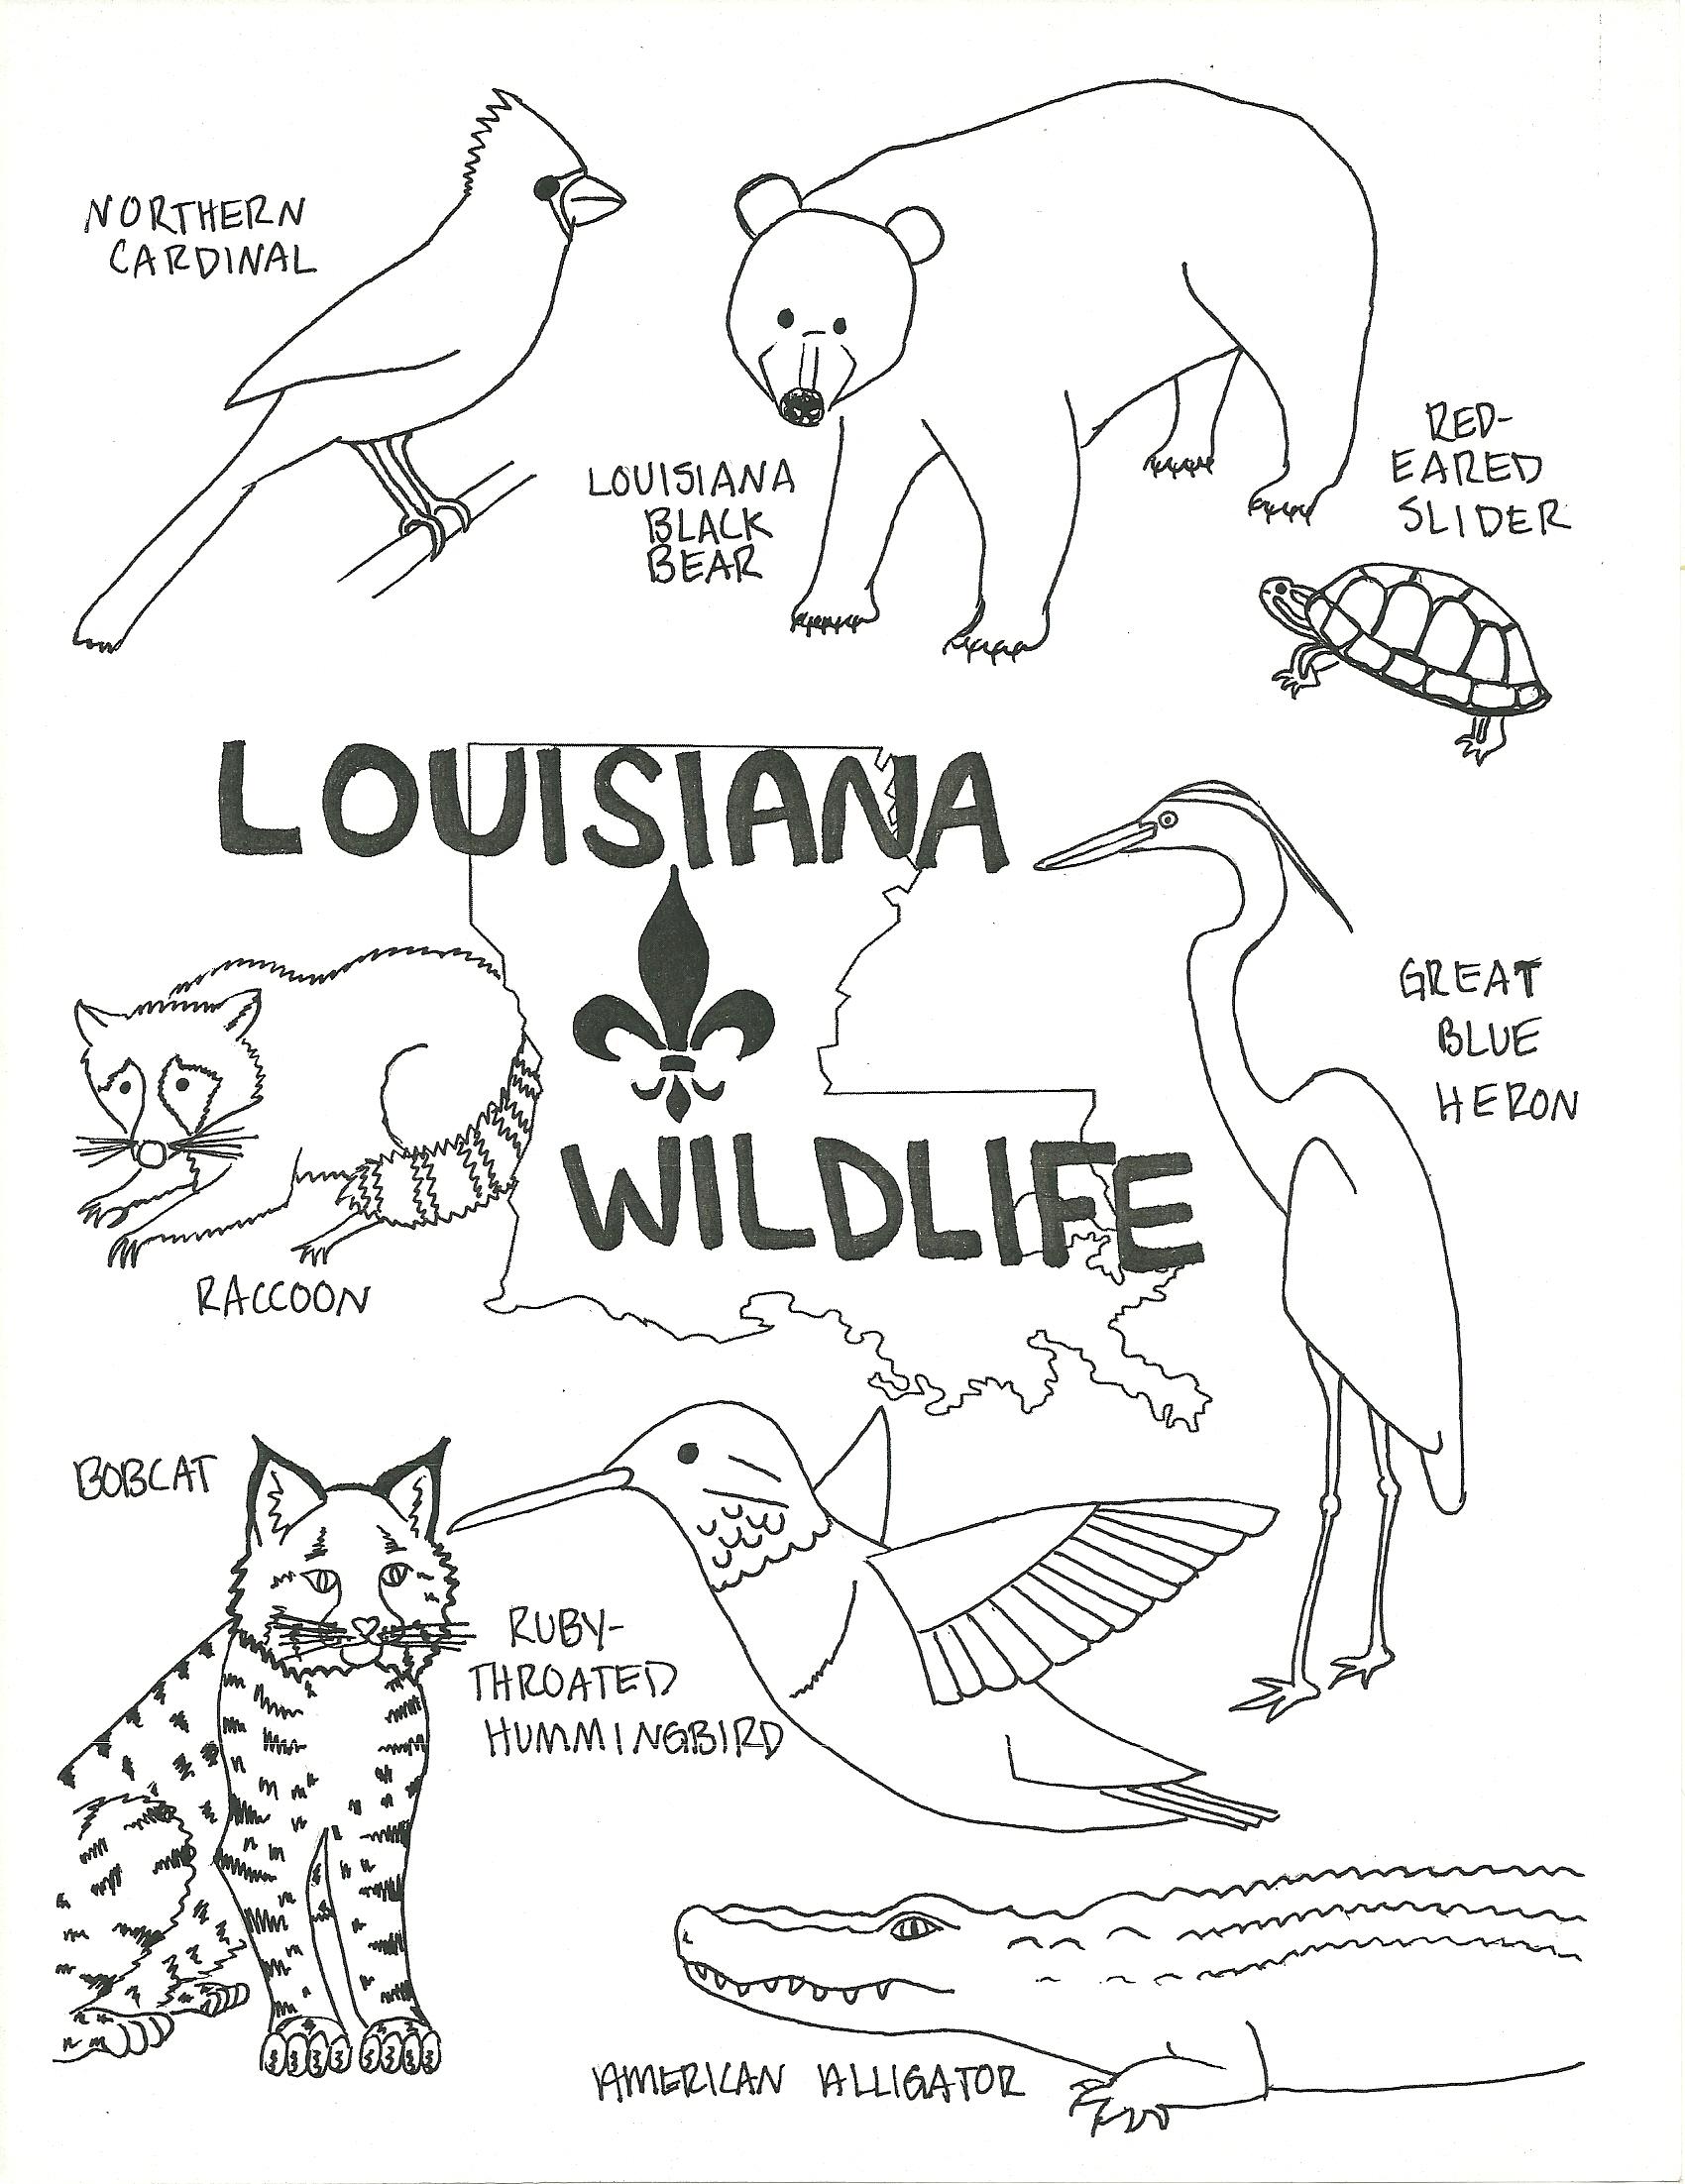 Louisiana symbols coloring pages coloring pages for Louisiana state symbols coloring pages